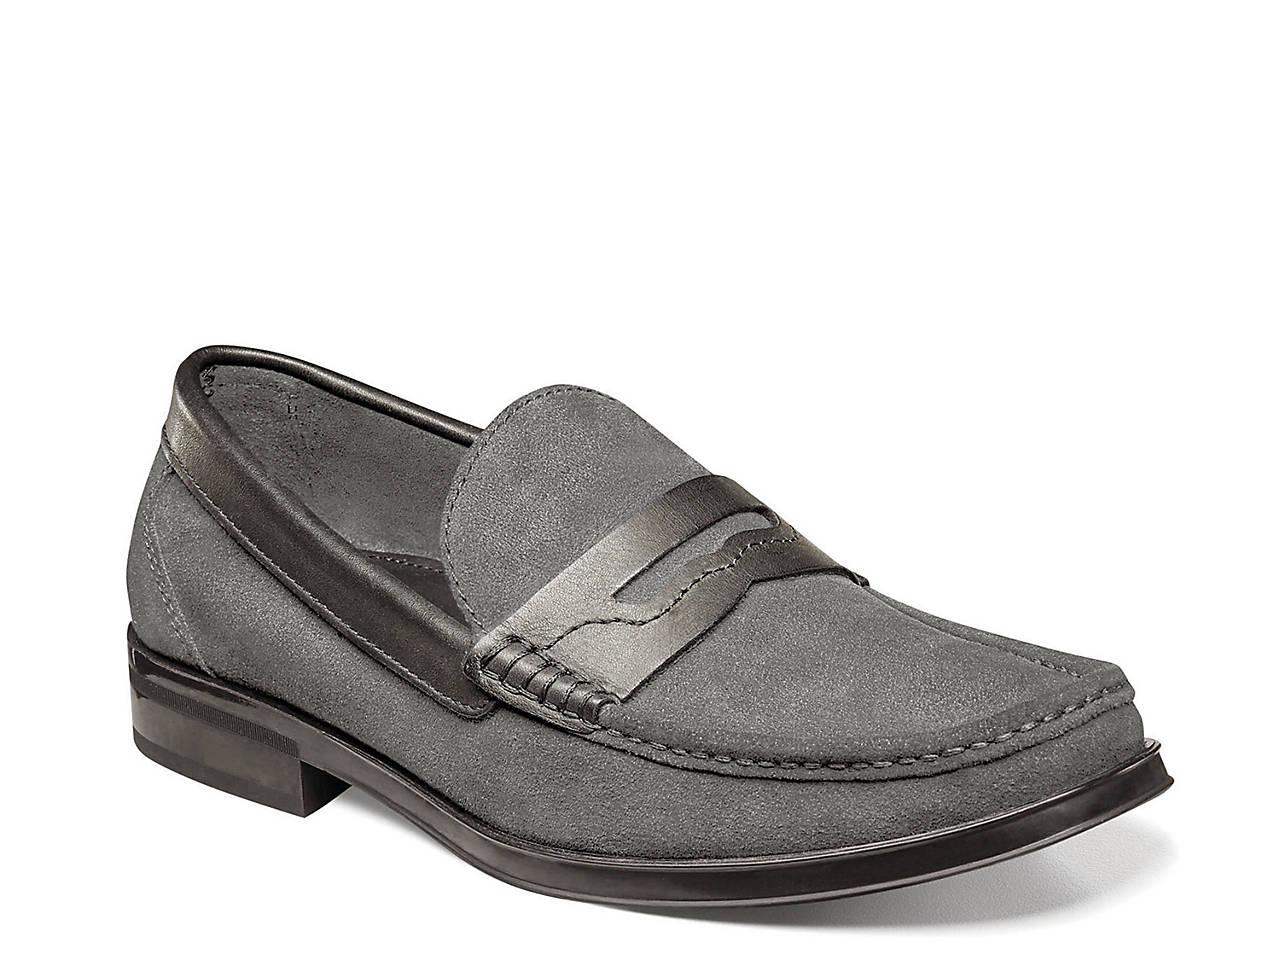 2367f32de0f Florsheim Westbrooke Suede Penny Loafer Men s Shoes